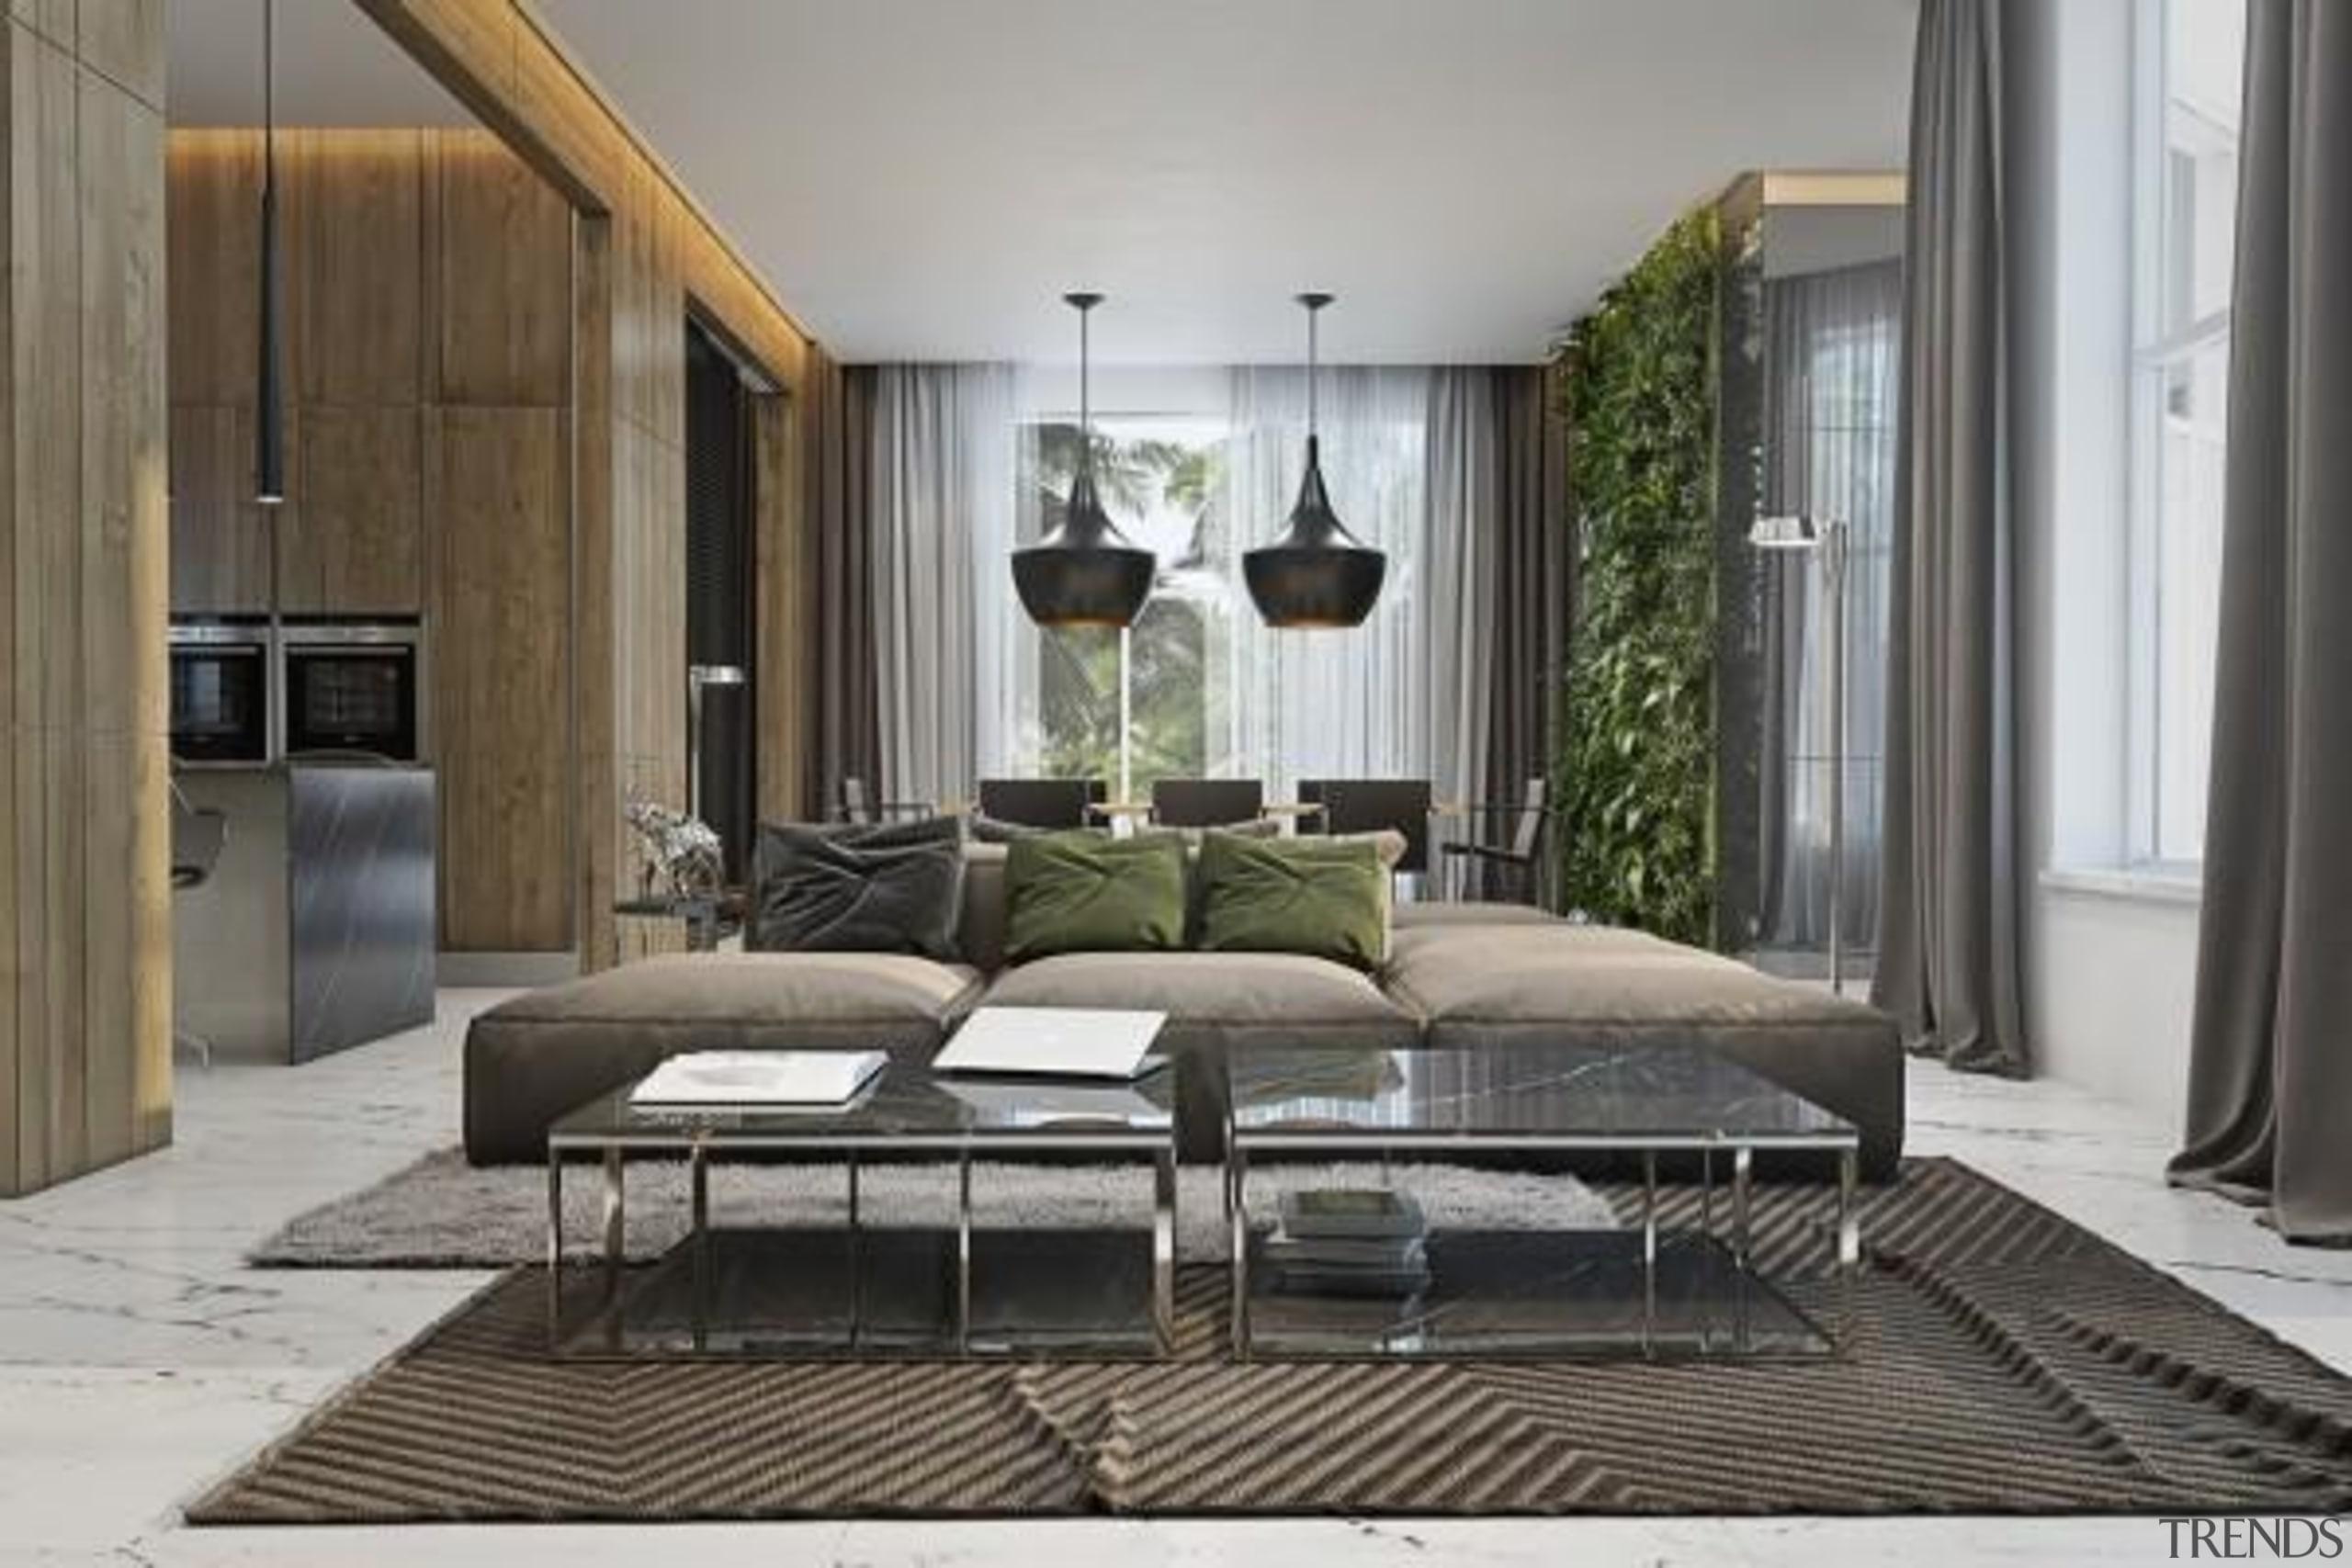 modern couch - Masculine Apartments - floor   floor, furniture, interior design, living room, gray, black